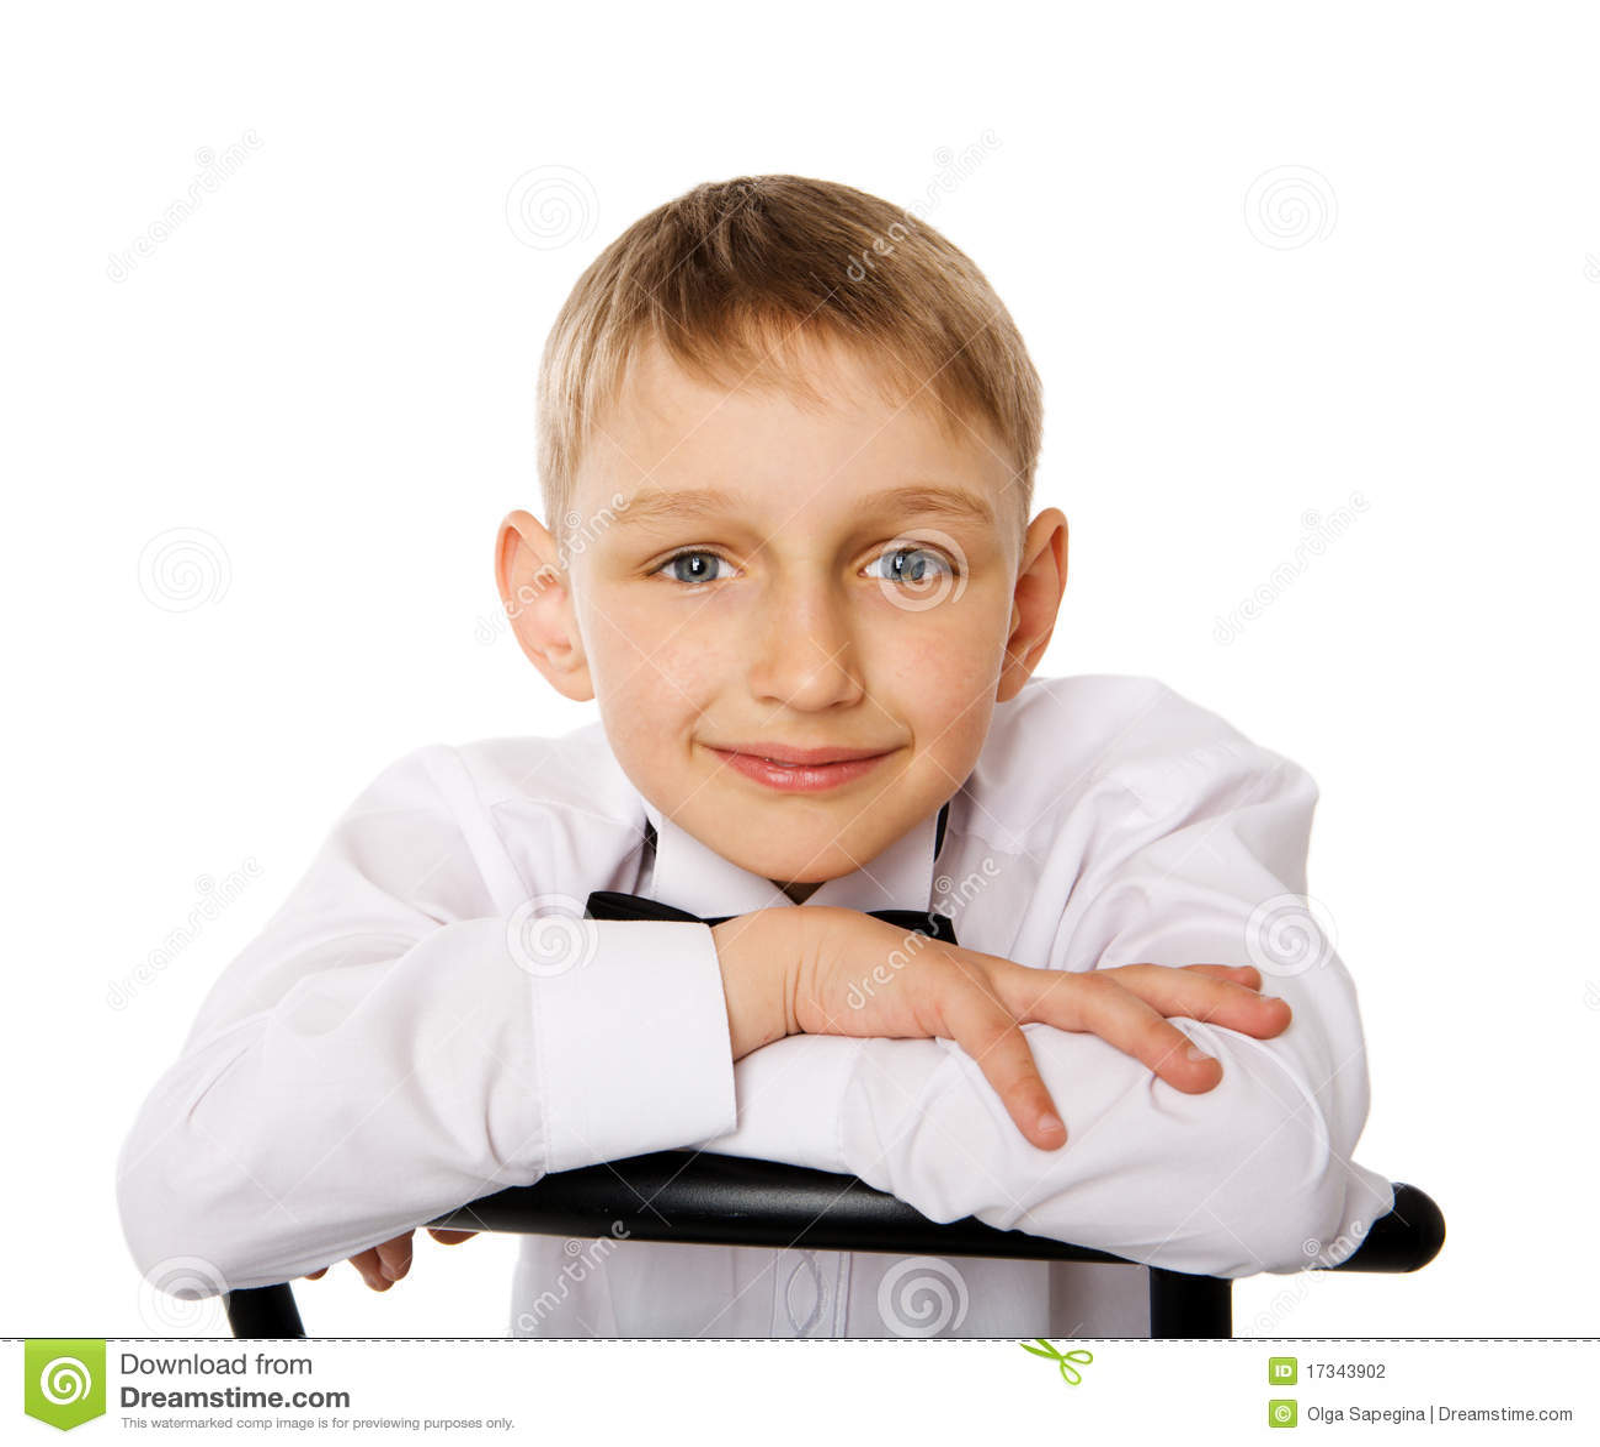 мальчику 7 лет картинки